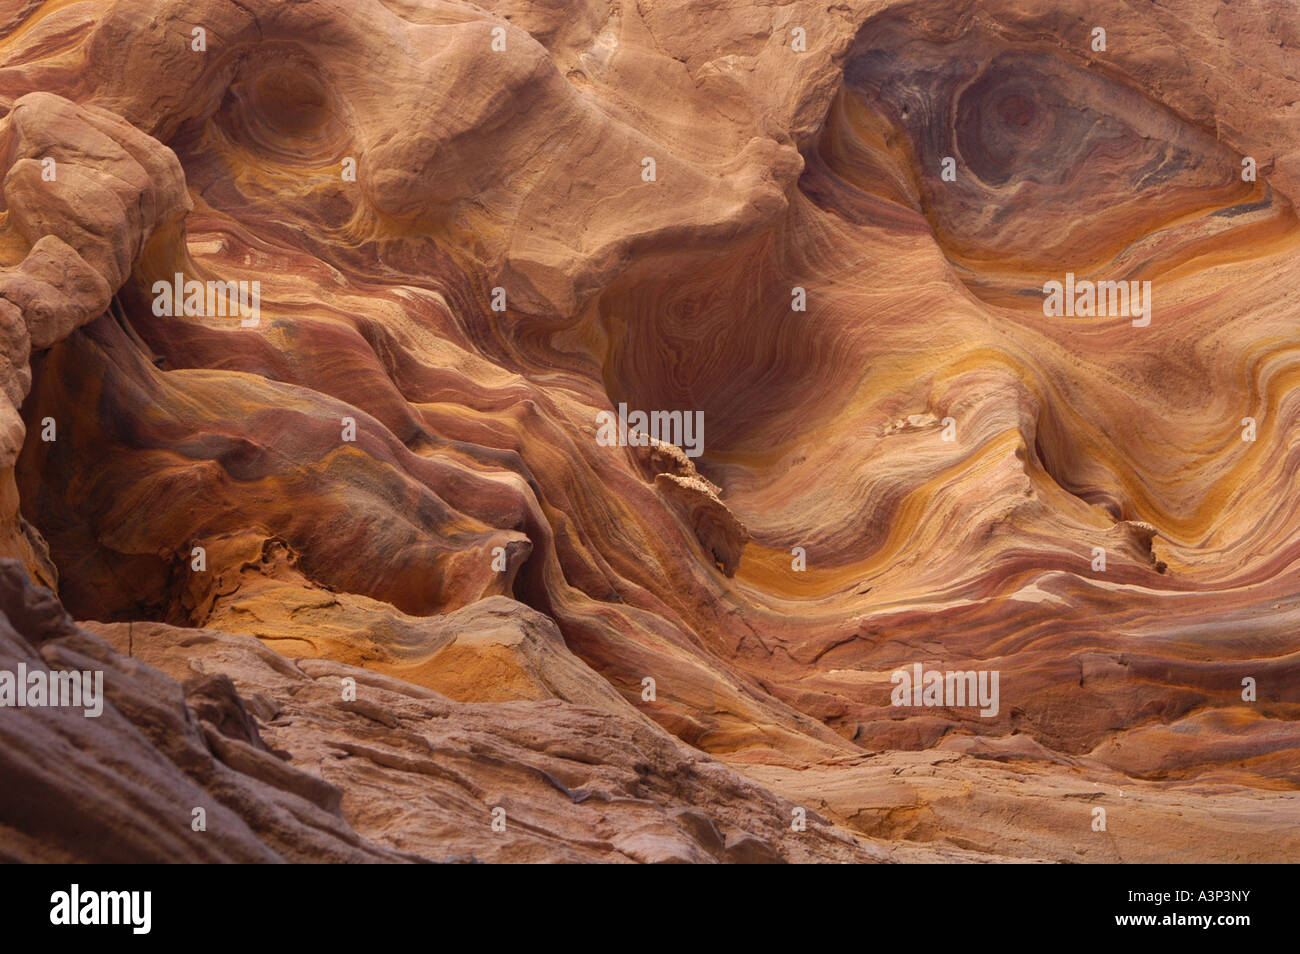 The Coloured Canyon near Nuweiba on the Sinai Peninsula, Egypt - Stock Image